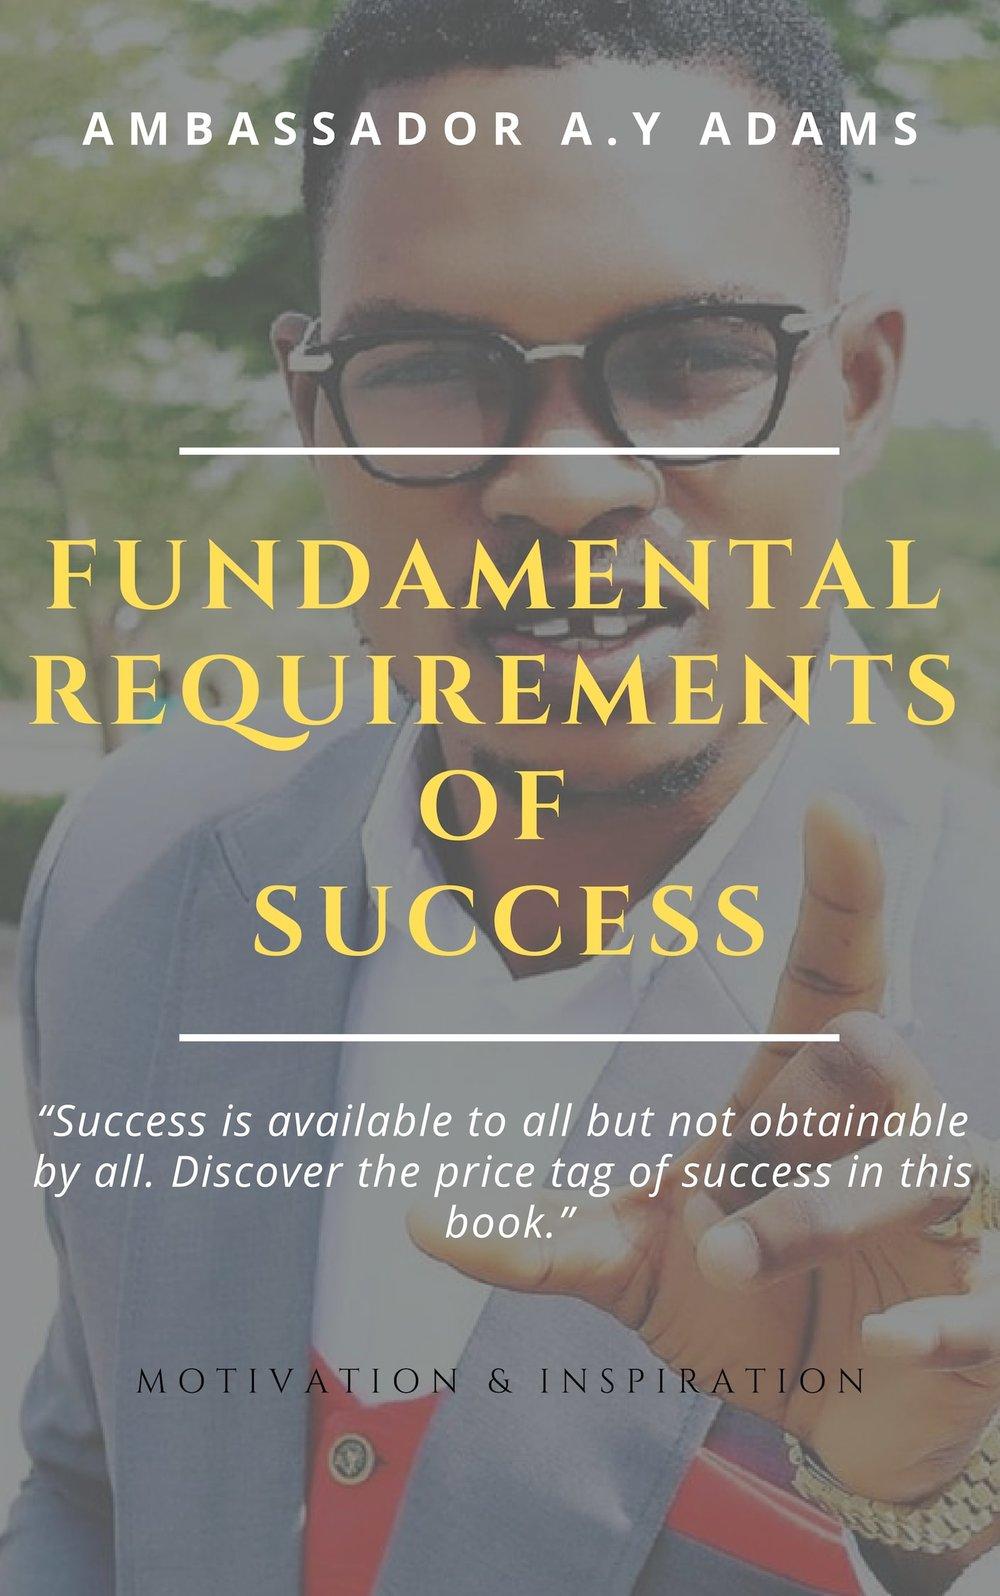 Fundamental-Requirements-of-Success-by-AY-Adams.jpg